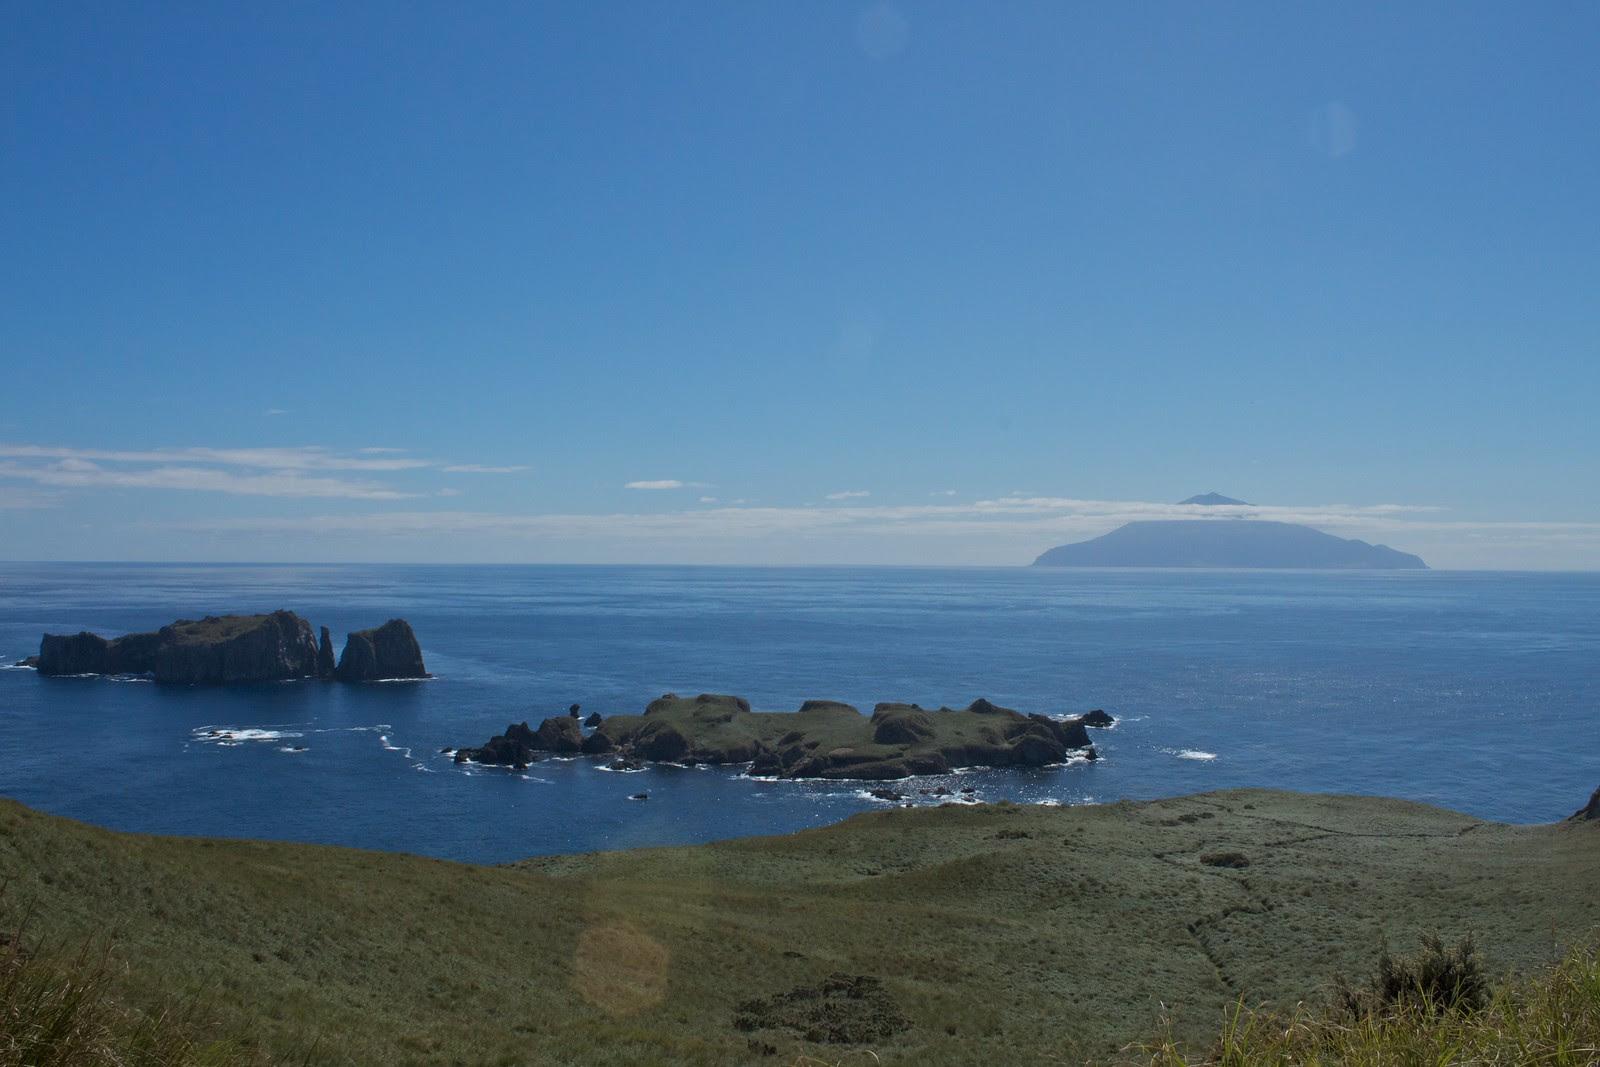 View of Tristan da Cunha from Nightingale Island